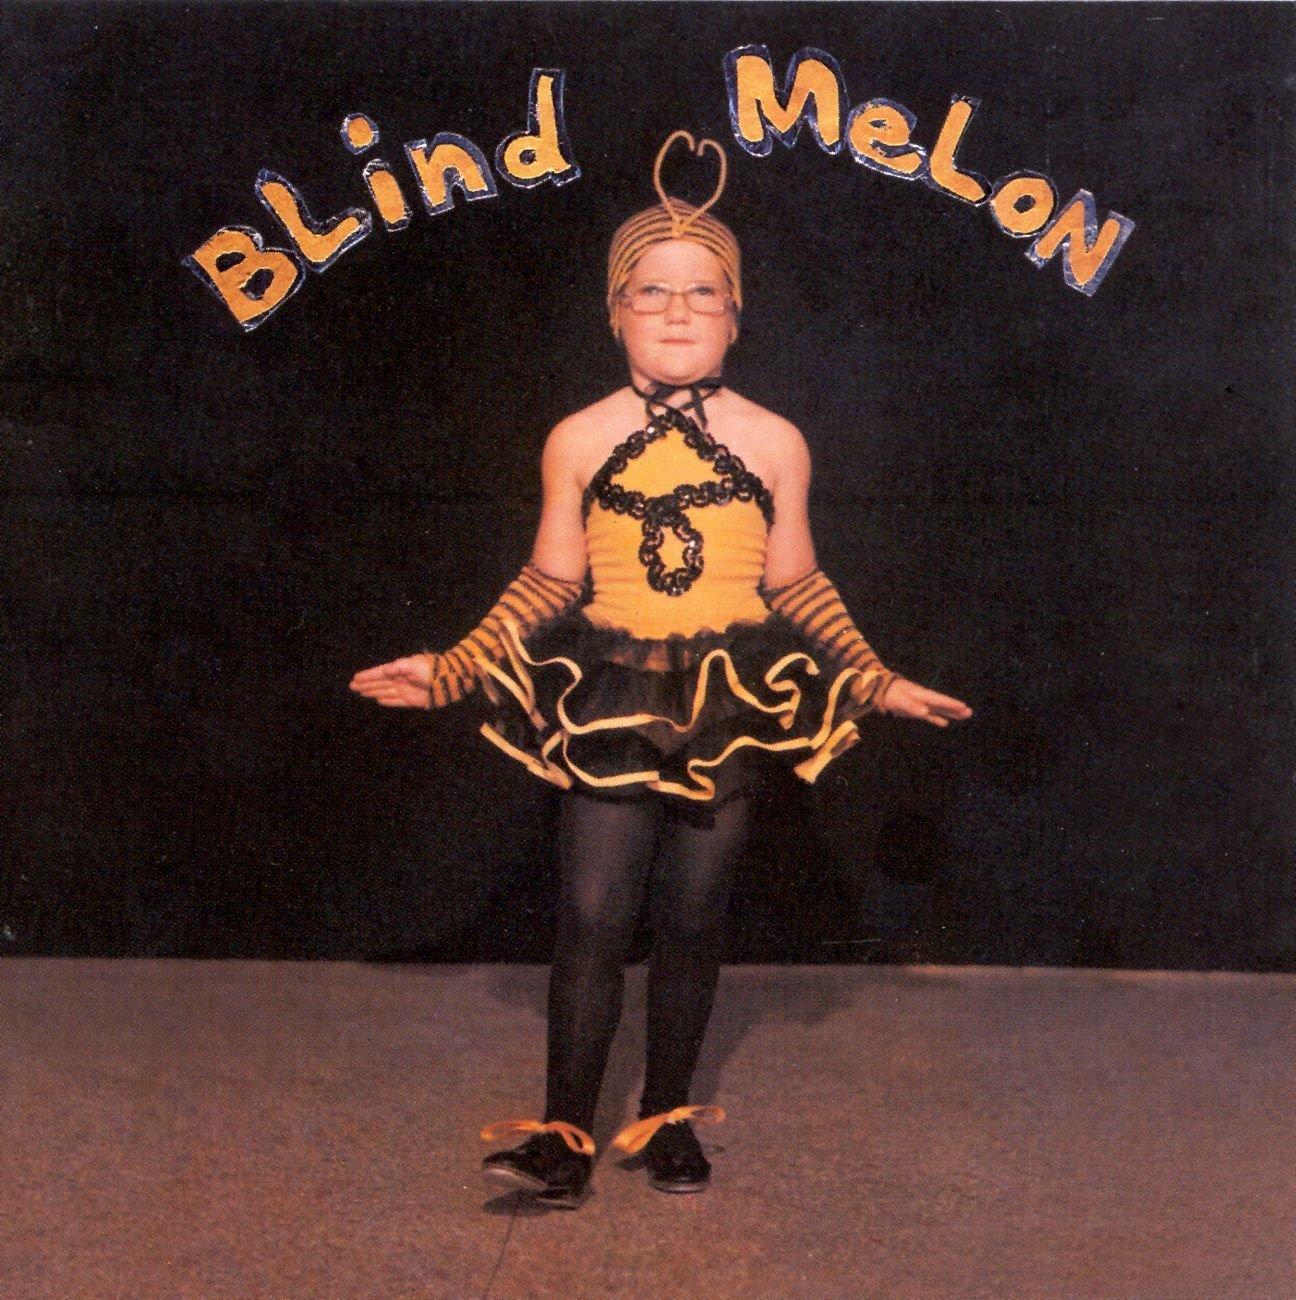 BLIND MELON  Blind Melon, 1992, Rick Parashar, 55:18